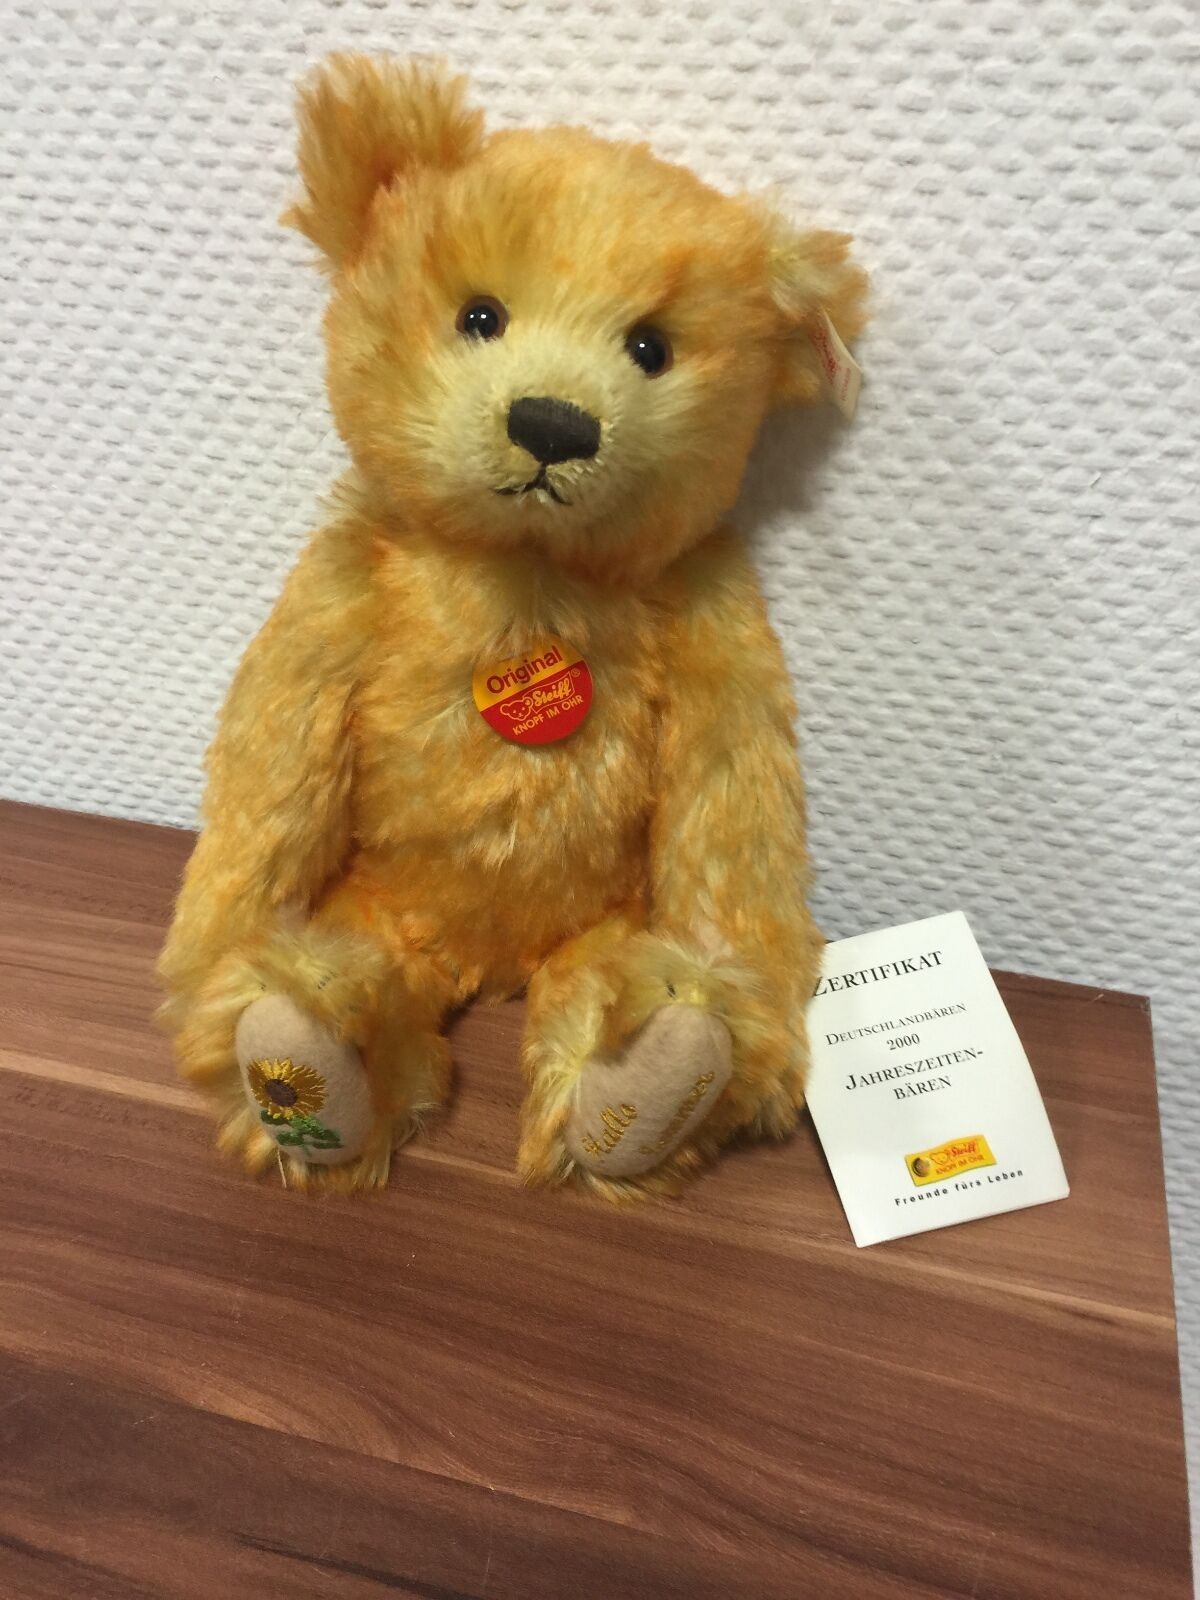 Steiff Teddy Bear 670459 Jahreszeitenbär Summer 30 cm  Never Never Never Unpacked e94